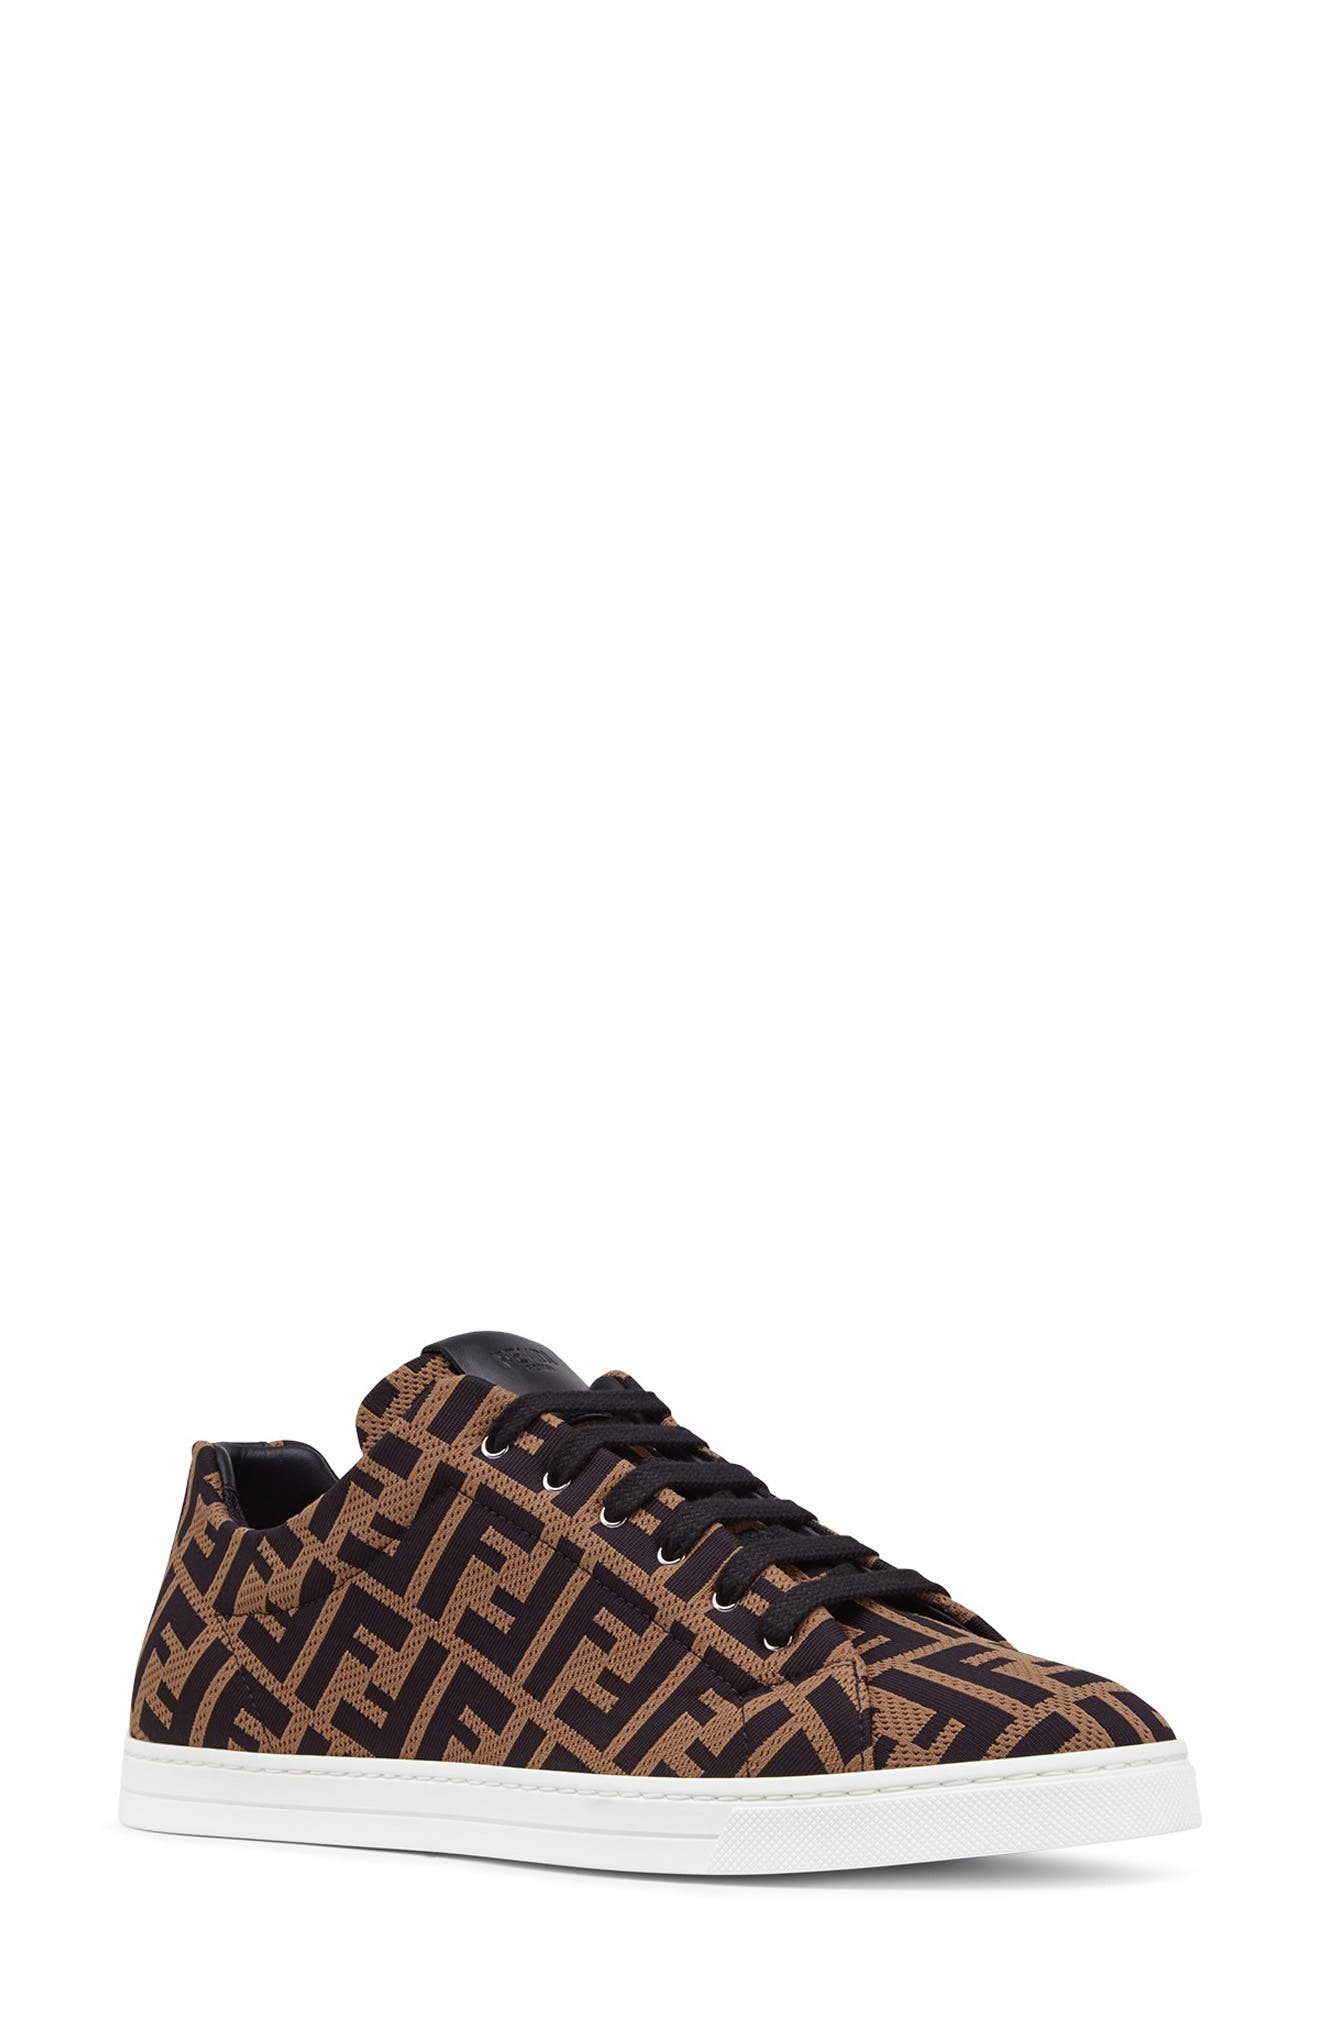 Men's Fendi Shoes | Nordstrom